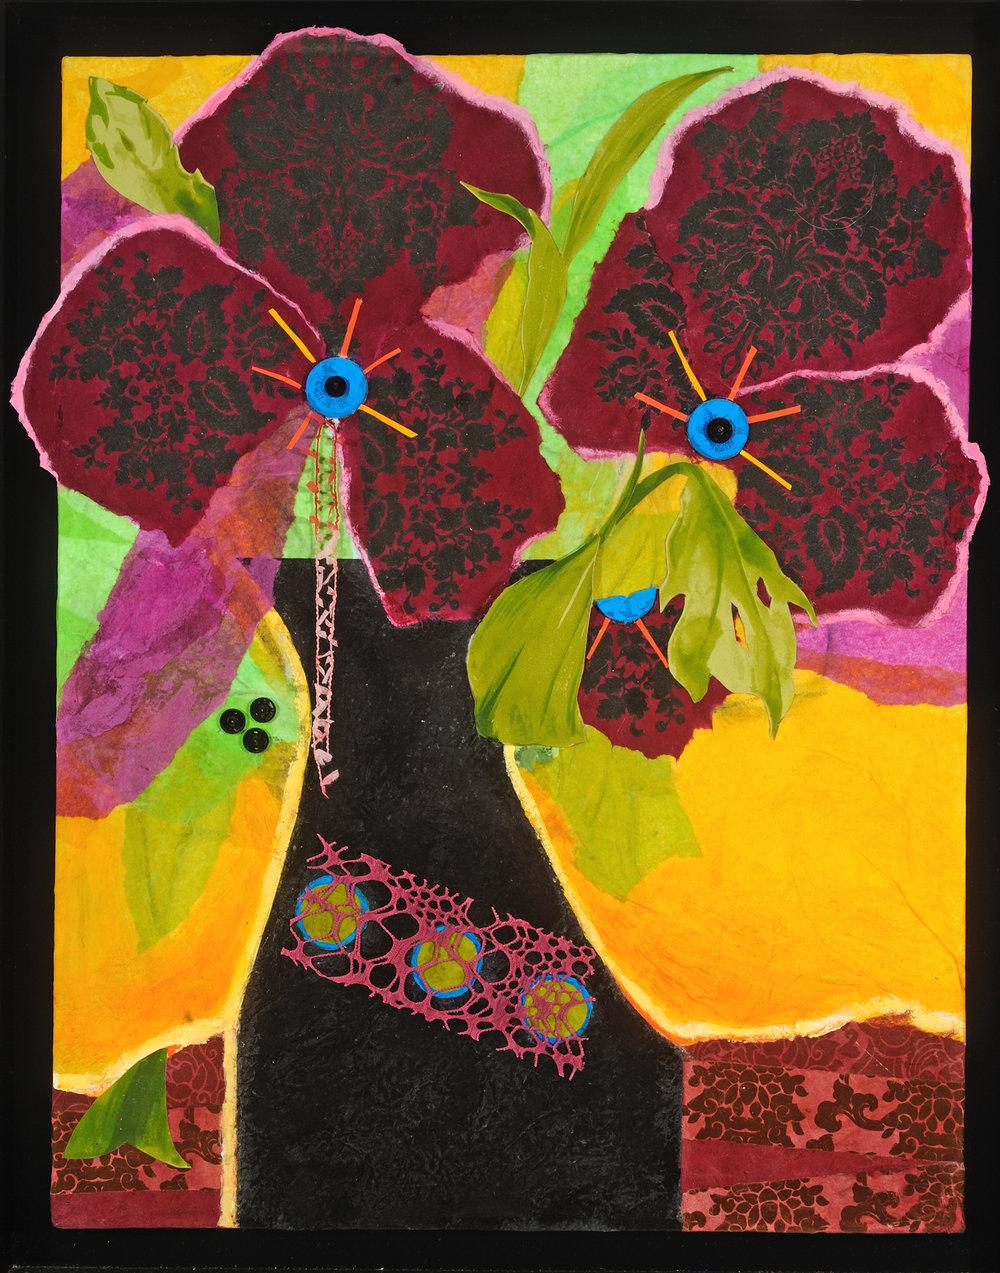 Jill Brantley_Little Black Vase_2015_Mixed media collage_20_ x 16__$450.jpg